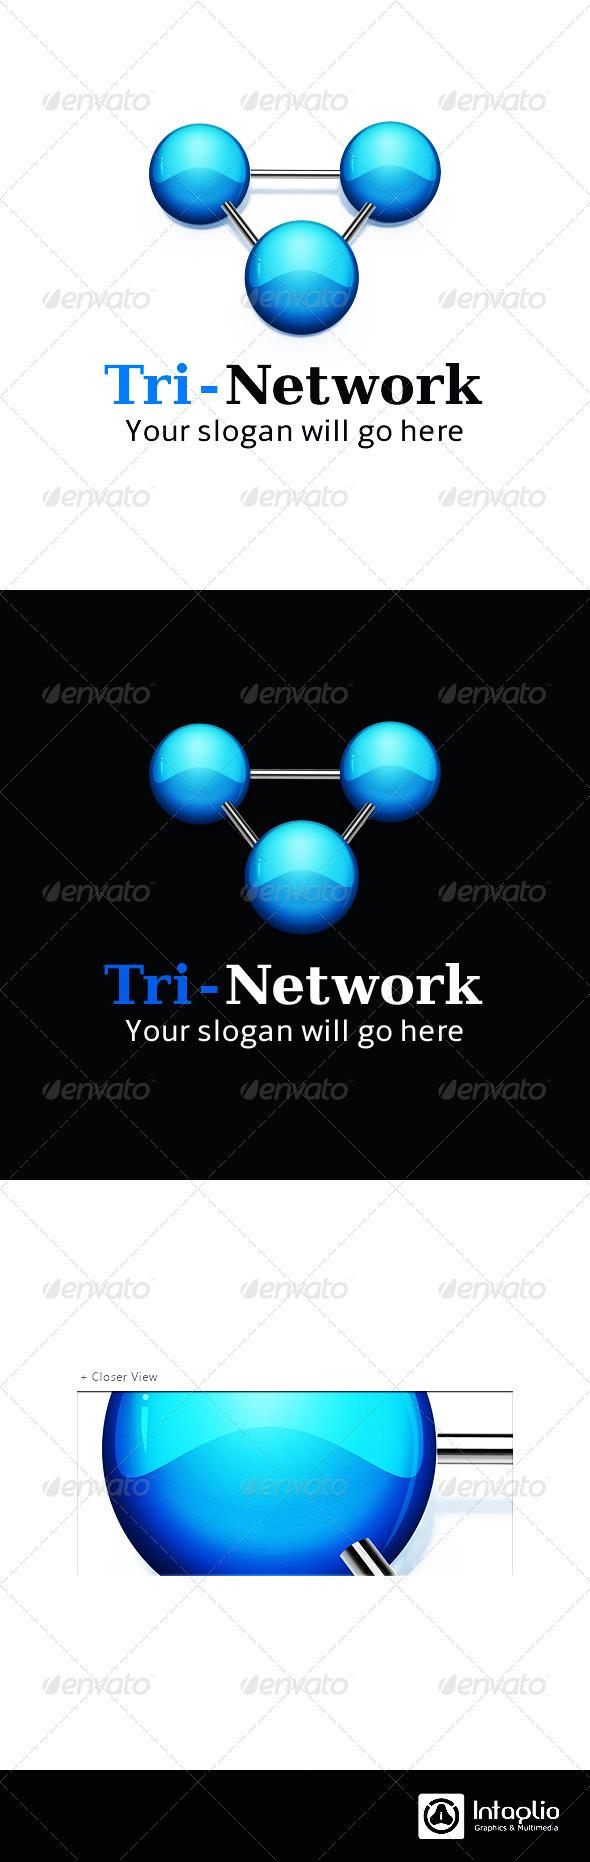 Technology Logo - Tri-Network